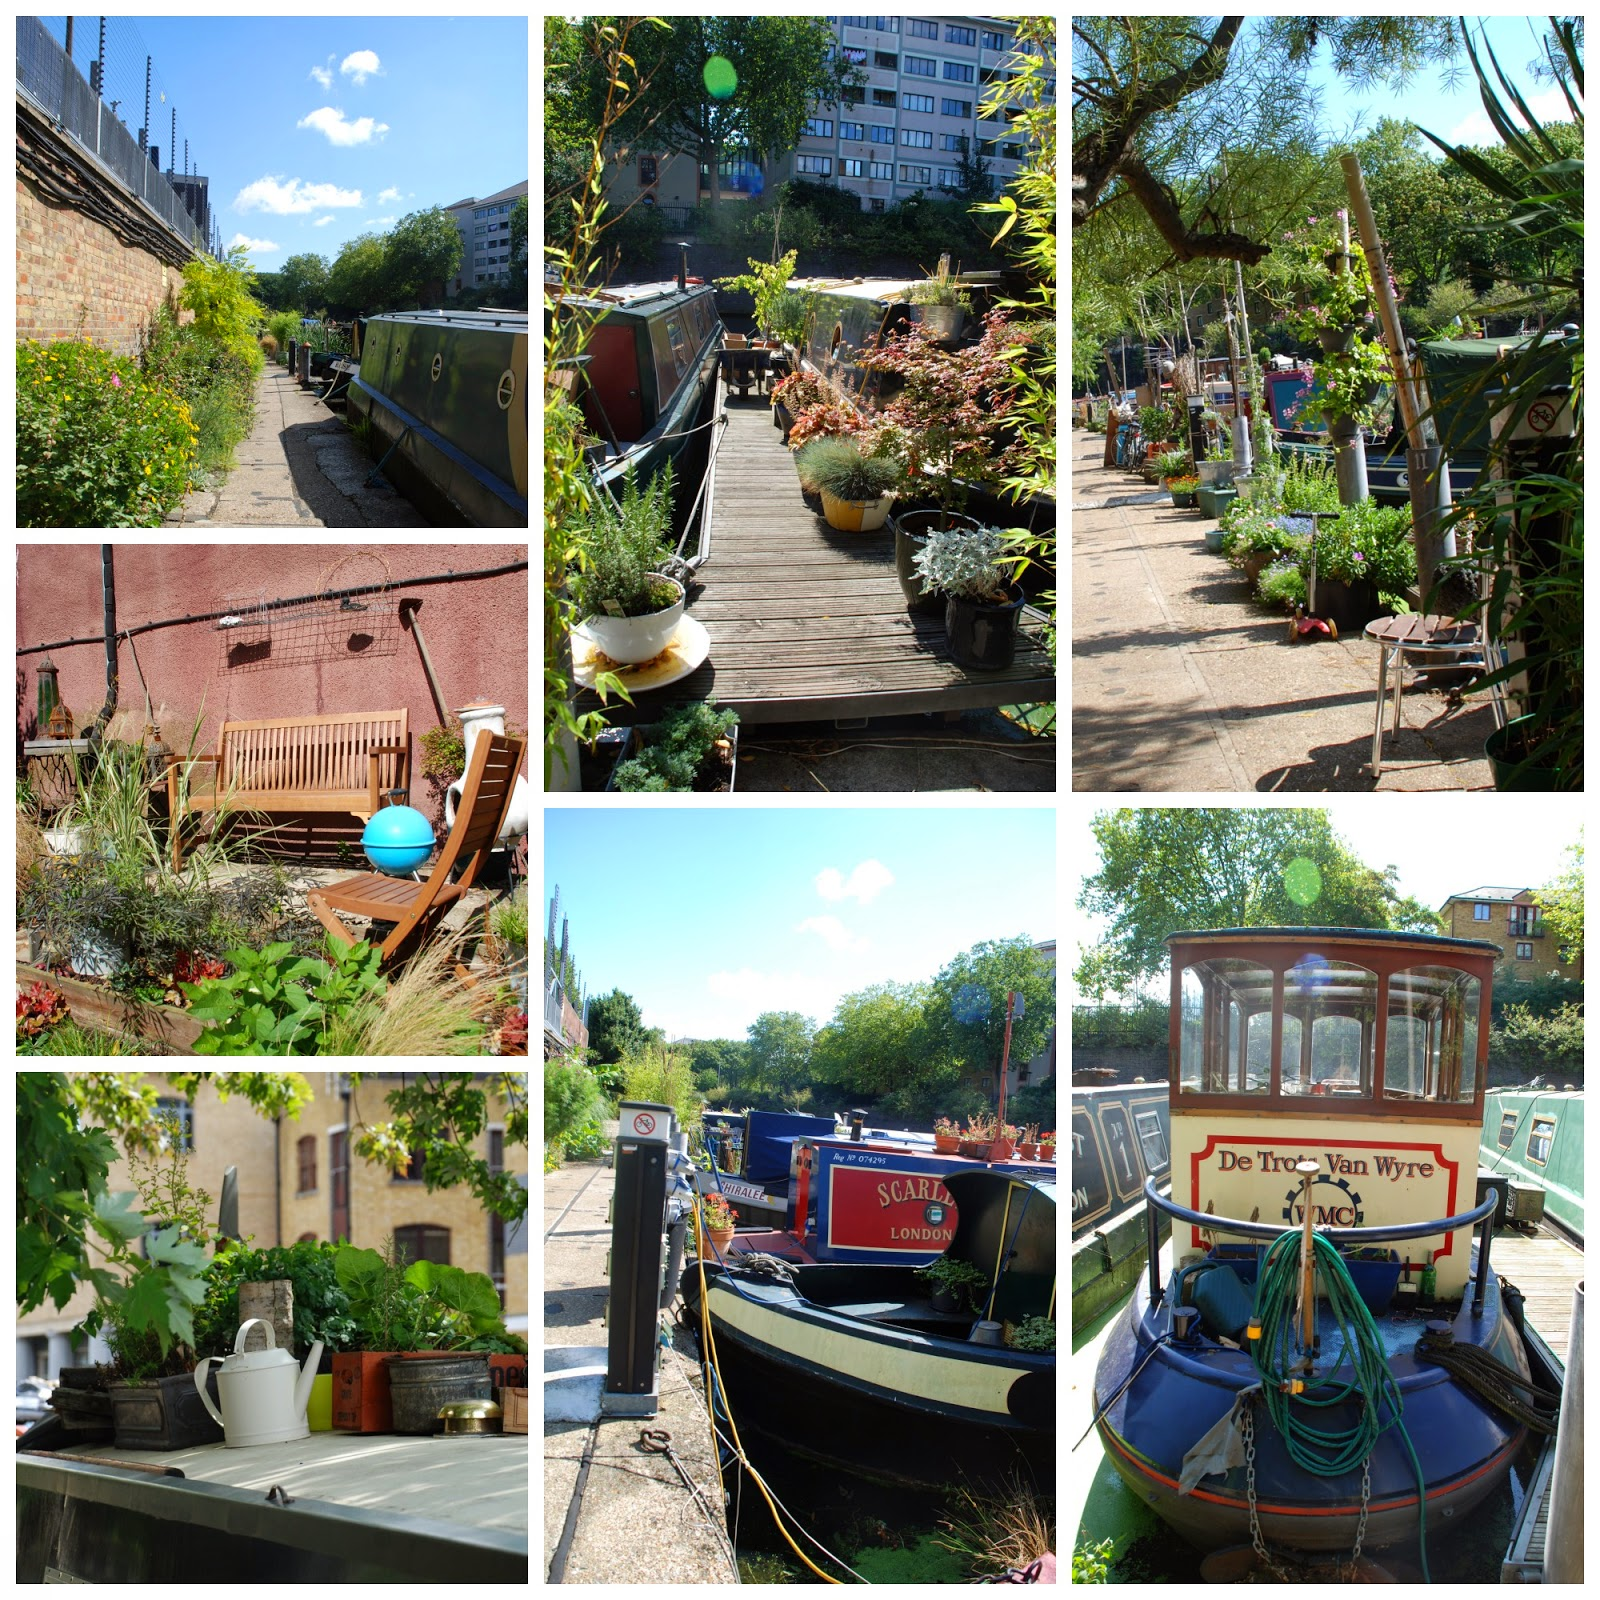 Lisson Grove Moorings,Regent's Canal, London